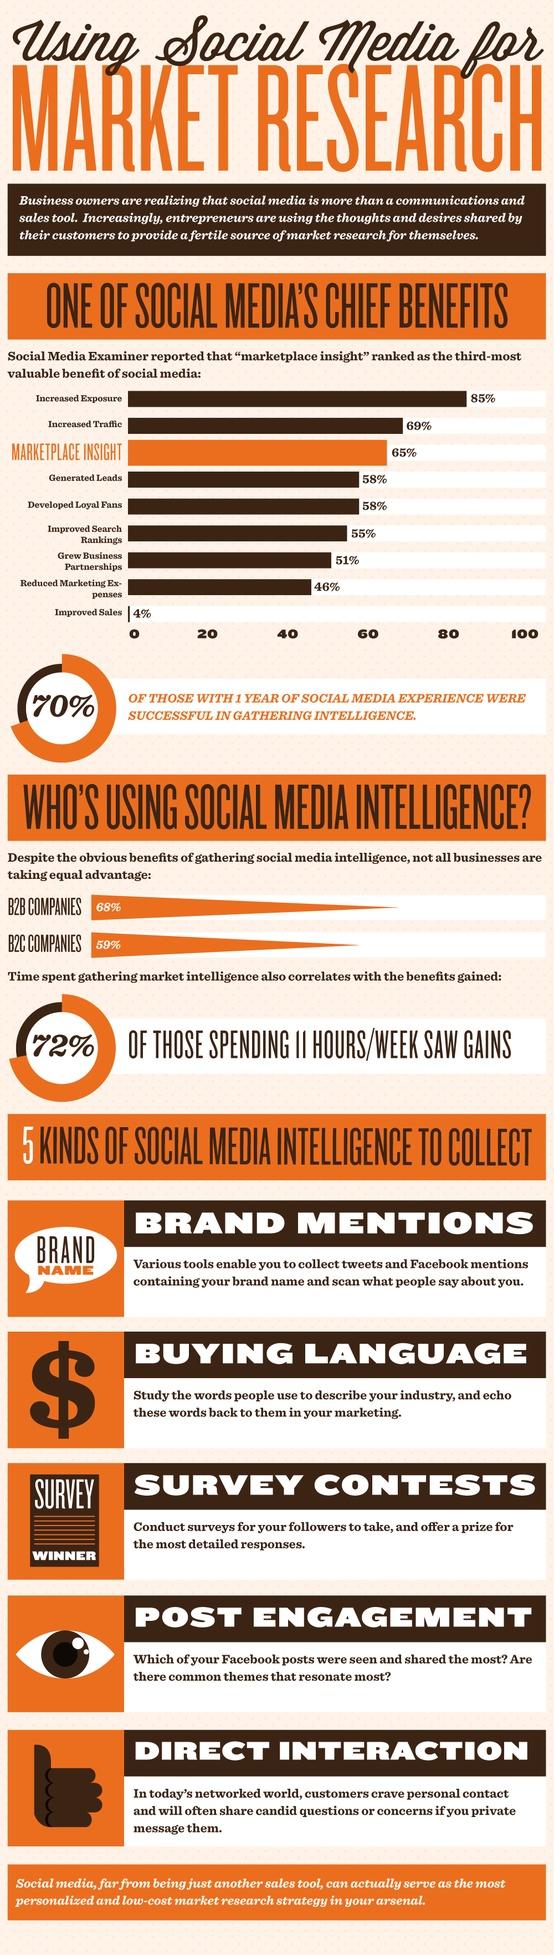 social media for market research